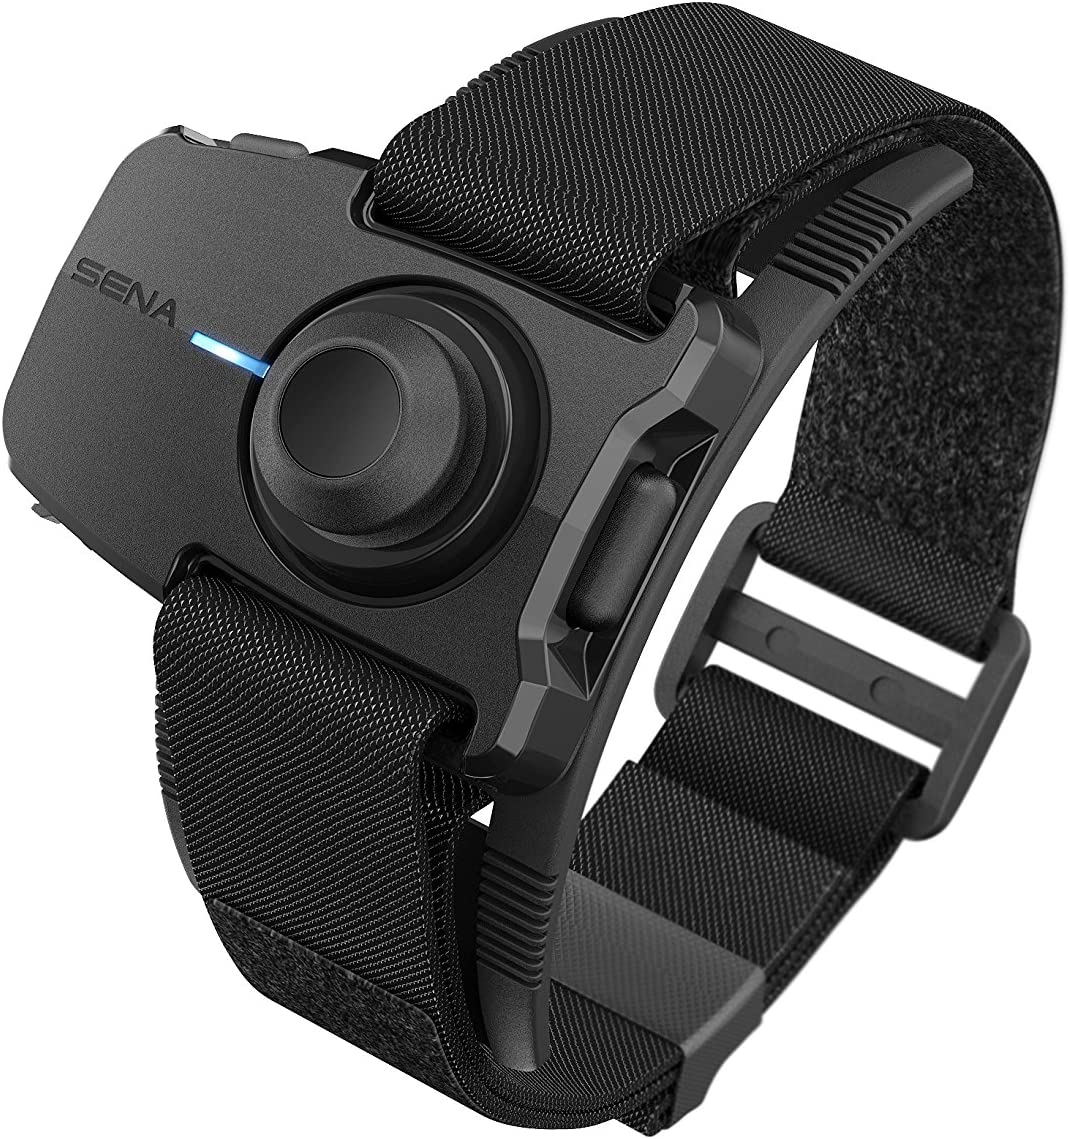 Sena SC-HR-01 Handlebar Remote for Bluetooth Communication System